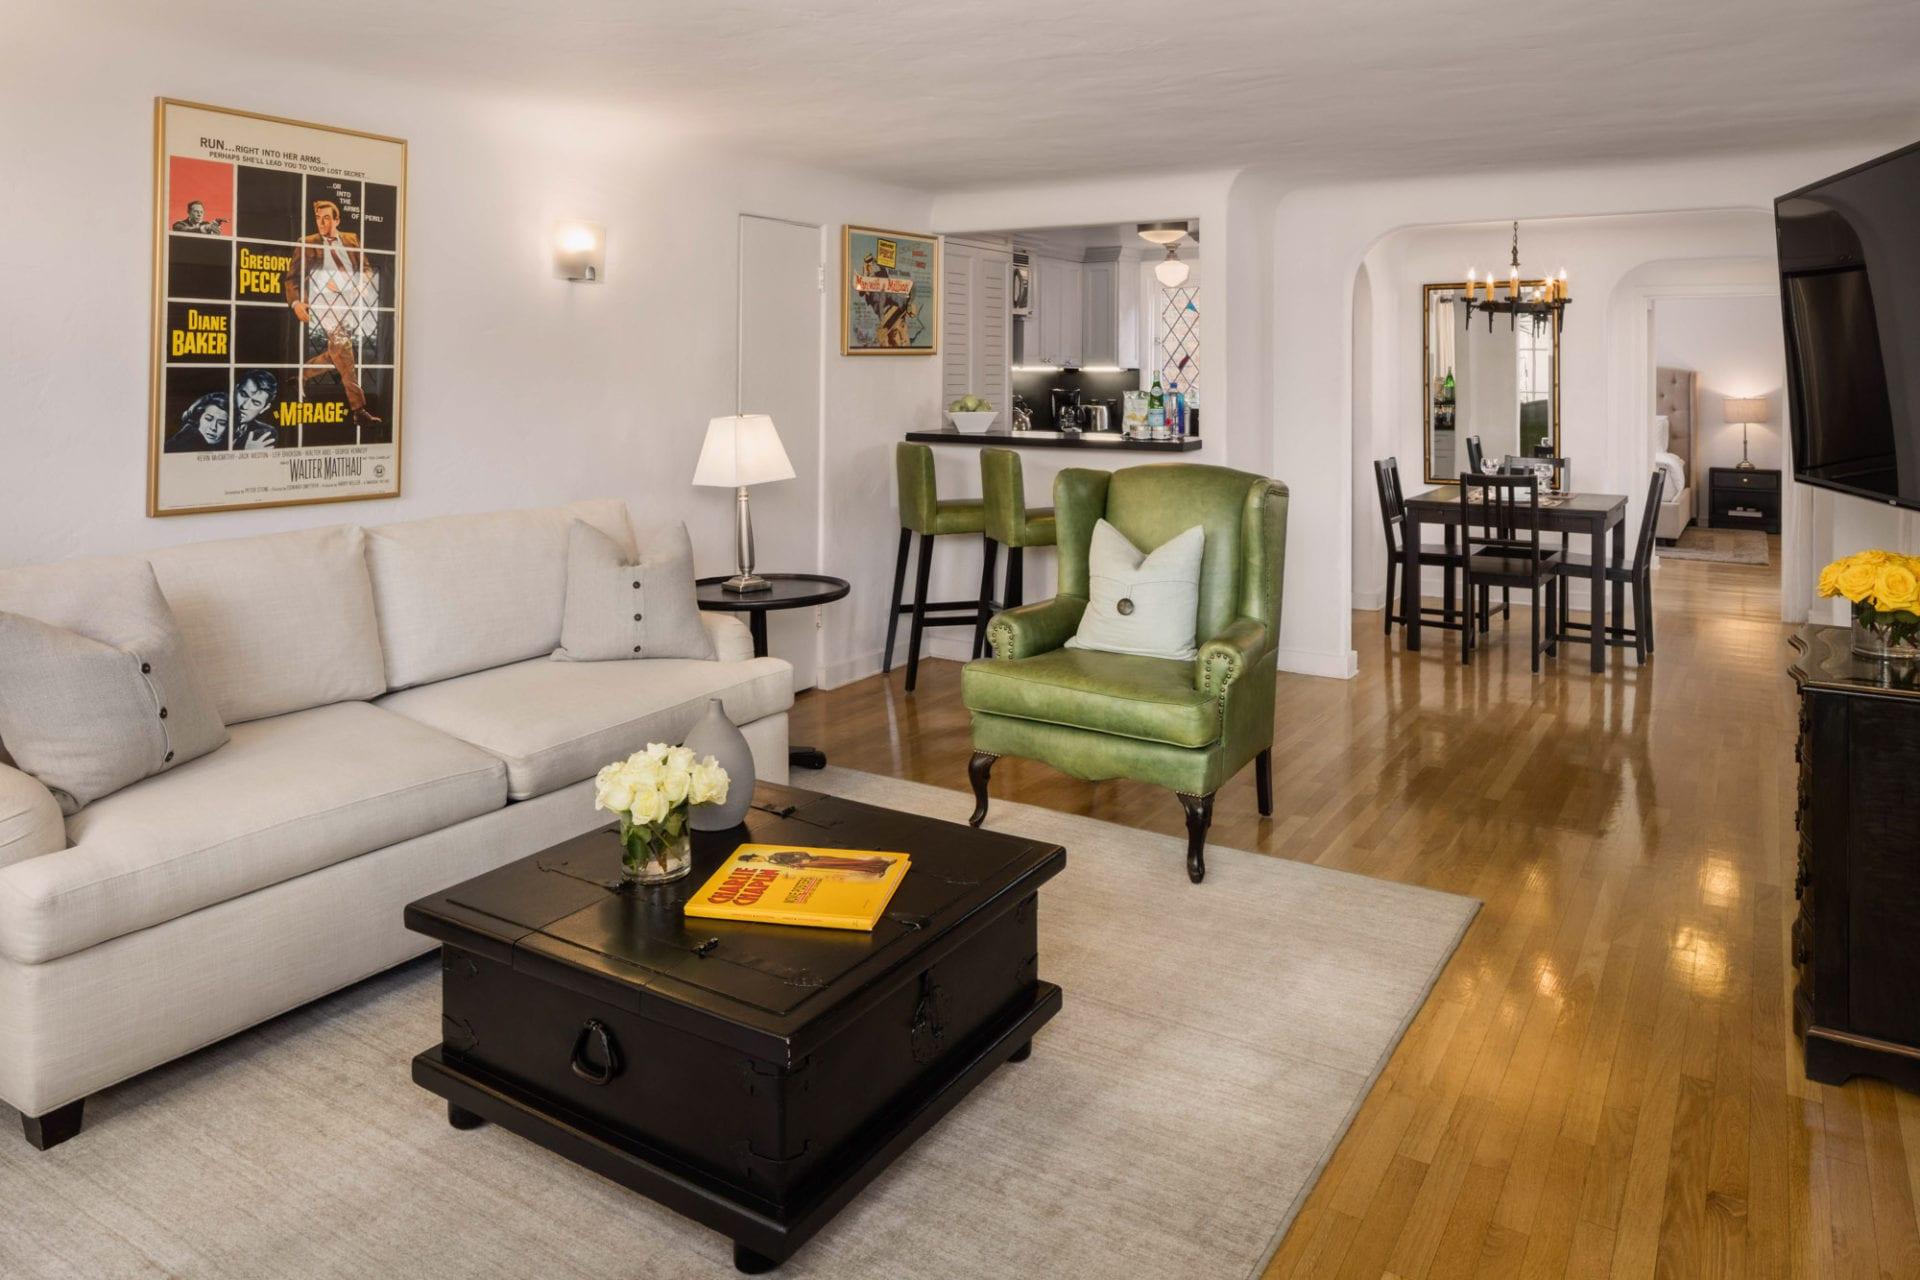 Gregory livingroom